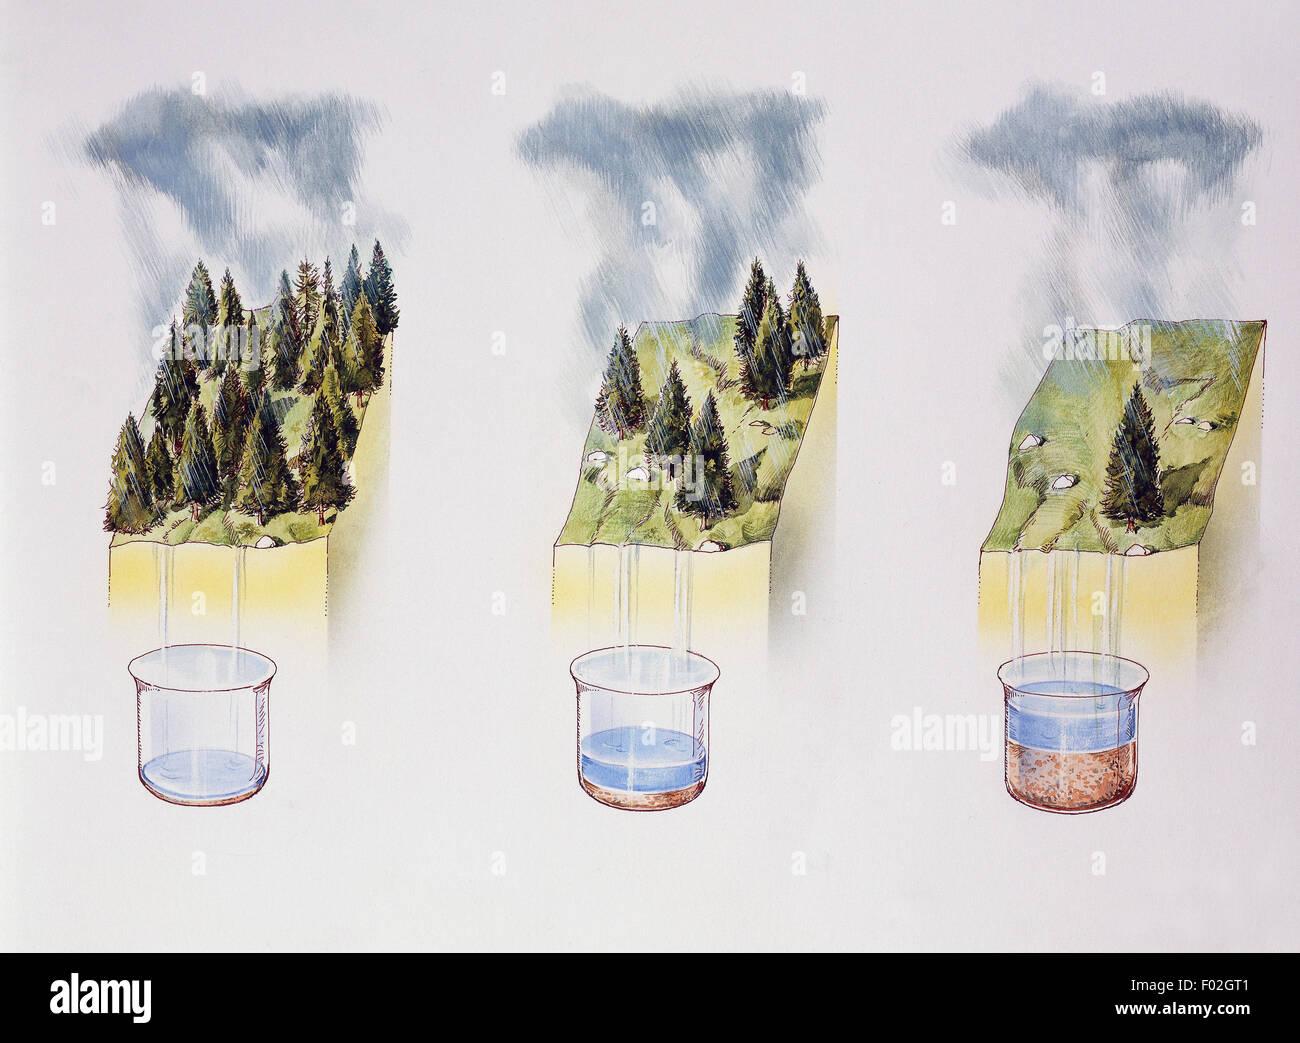 Example of how vegetation density influences soil erosion, drawing. - Stock Image